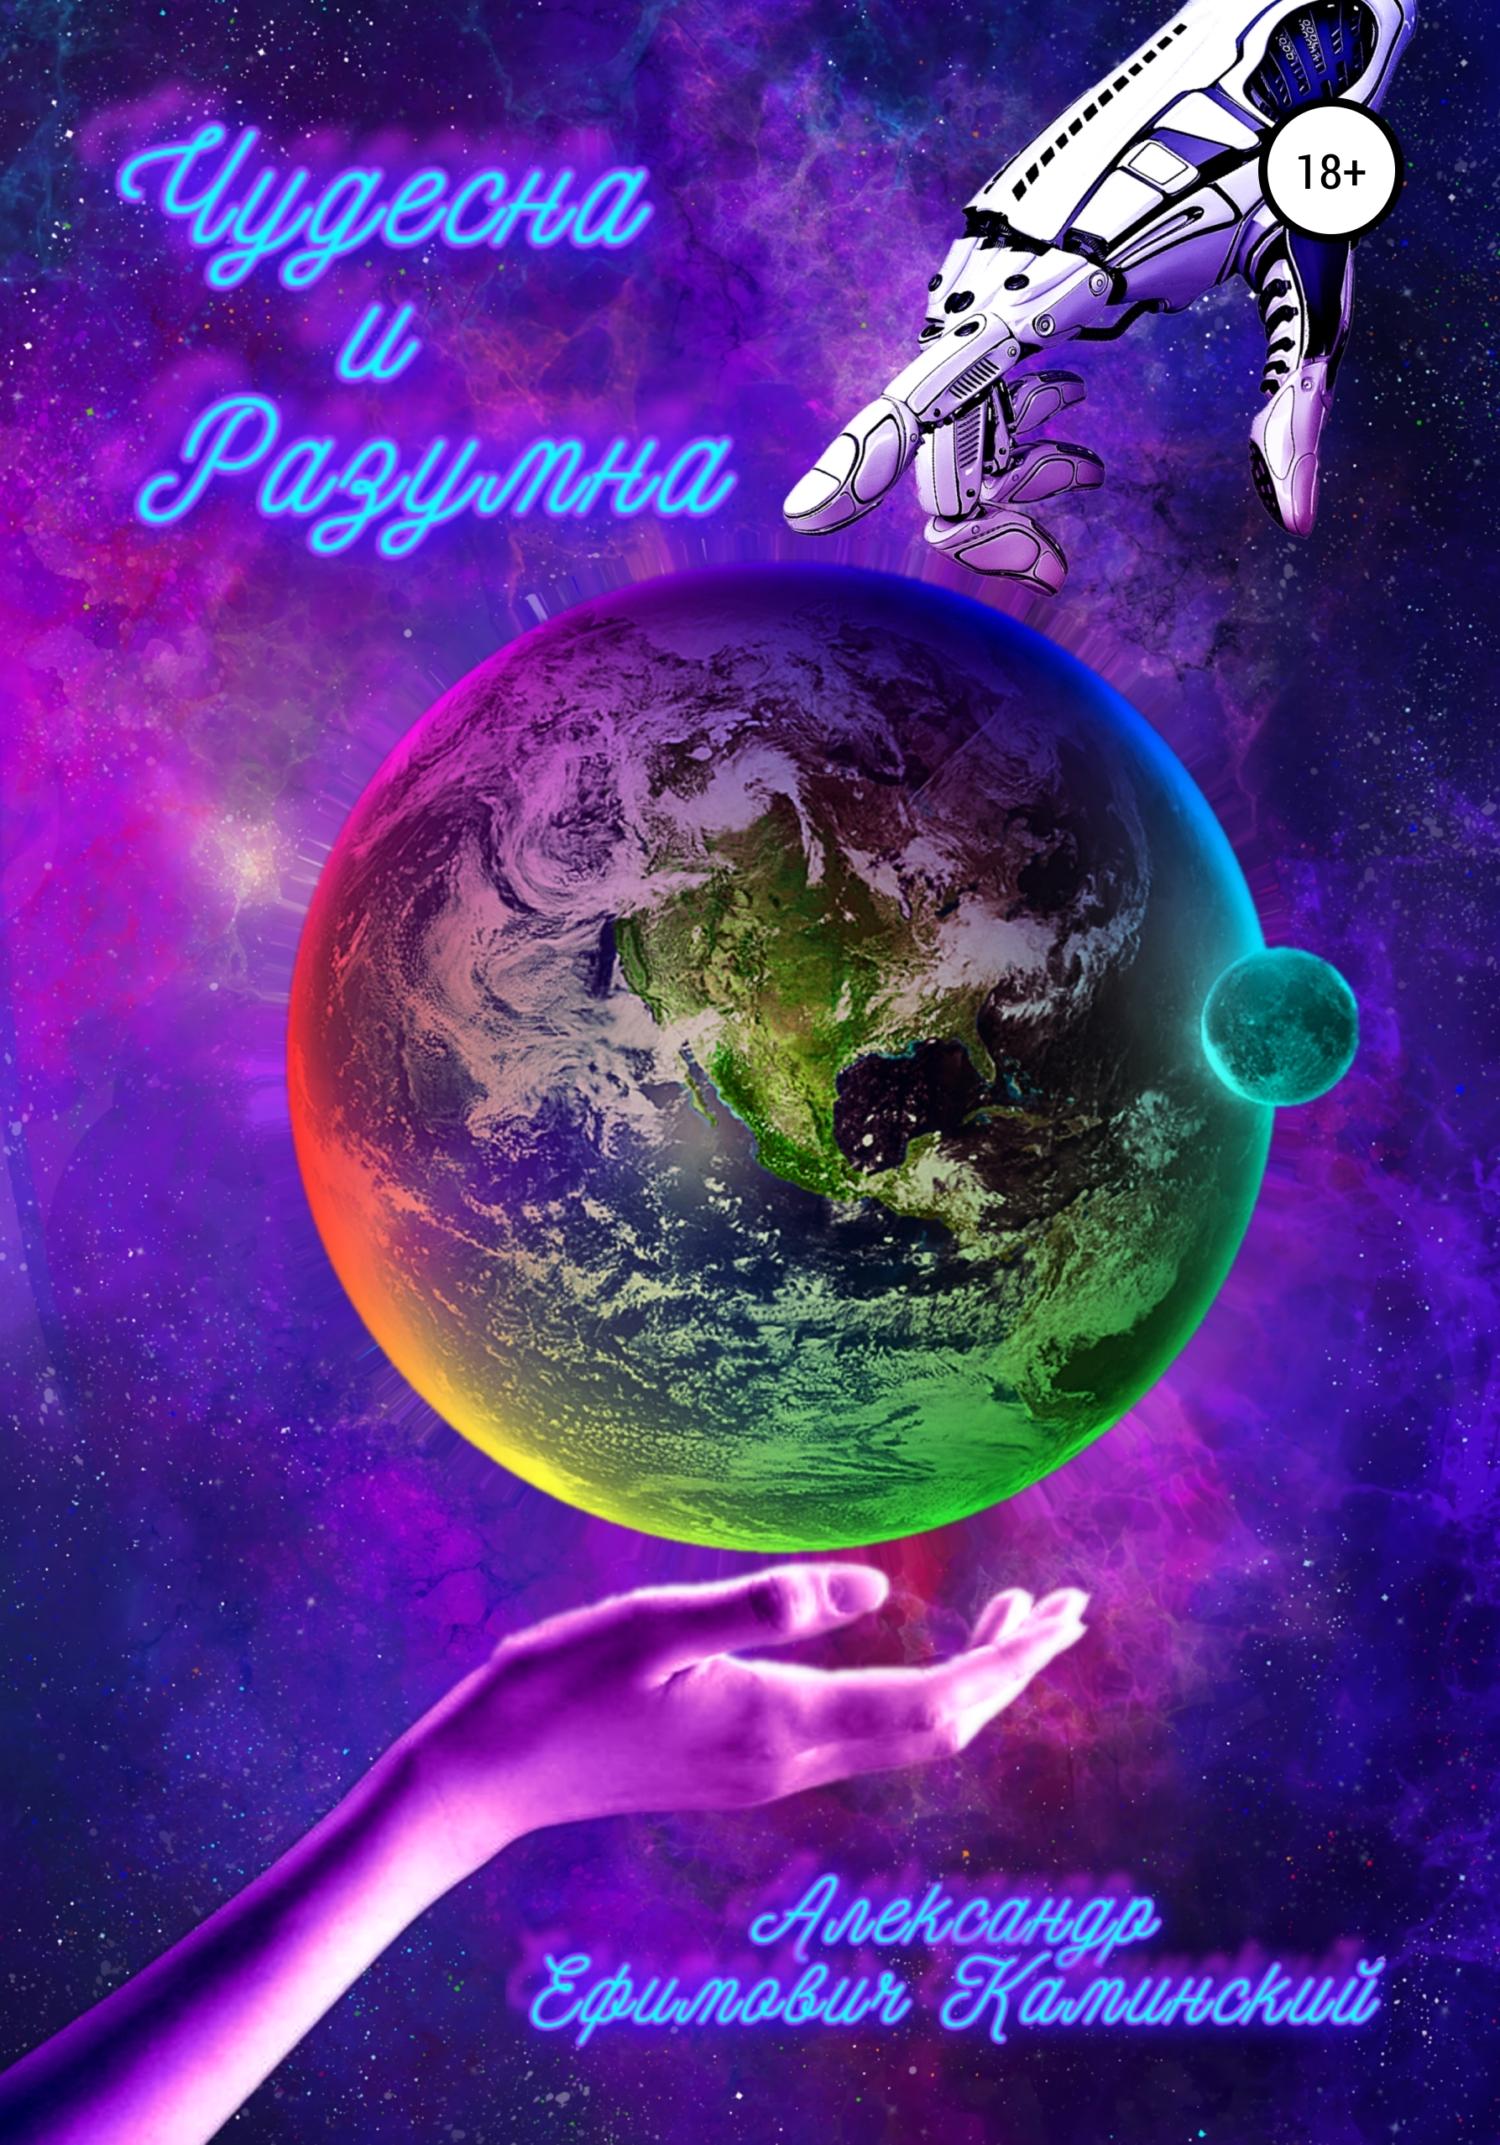 Купить книгу Чудесна и разумна, автора Александра Ефимовича Каминского